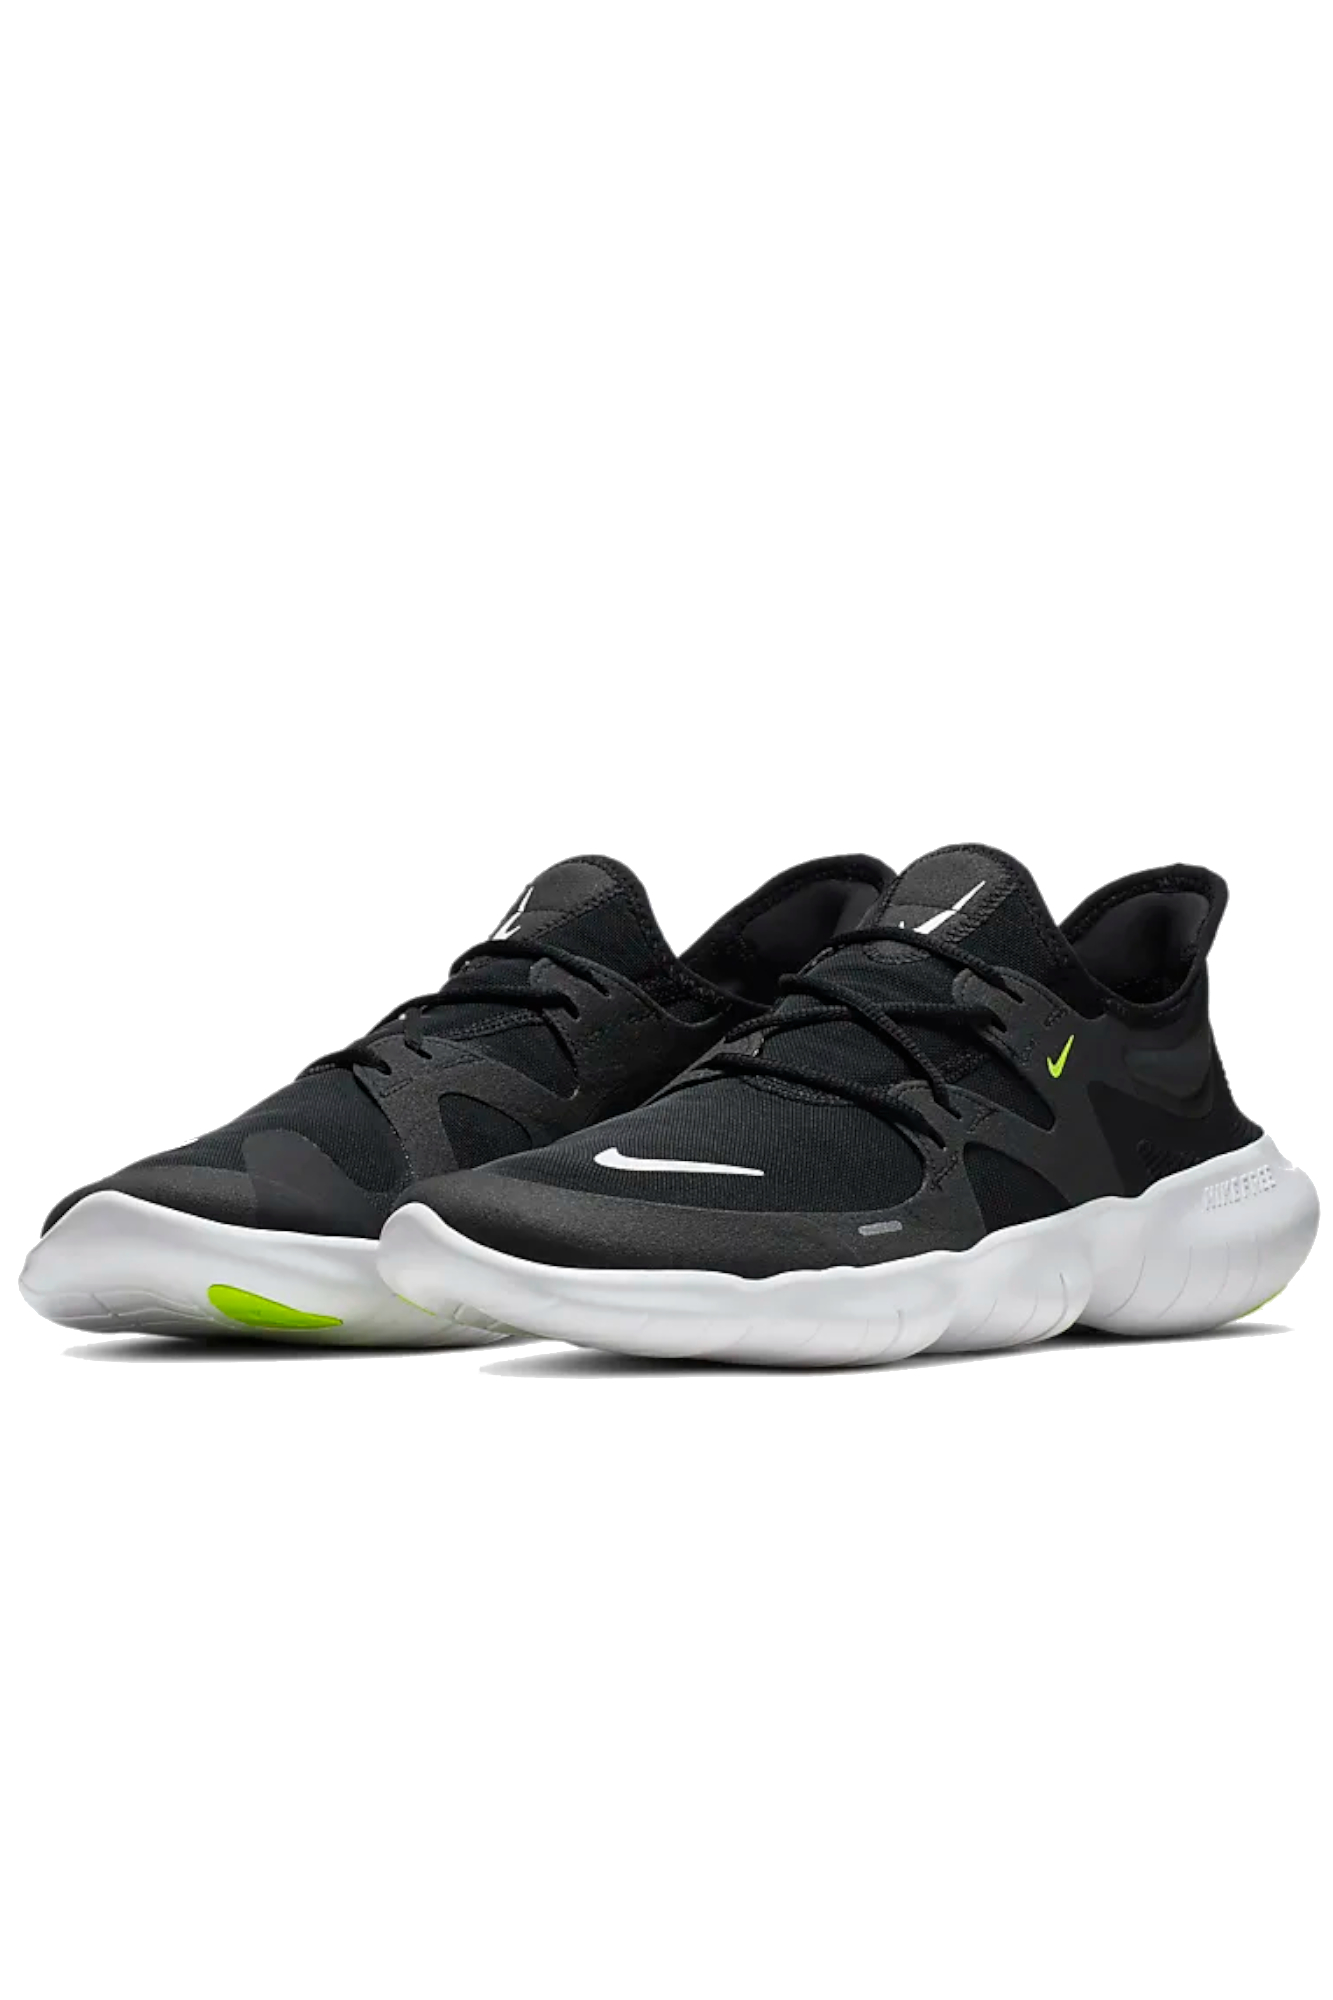 Buty Nike Free RN 5.0 AQ1289 003 Do biegania Buty